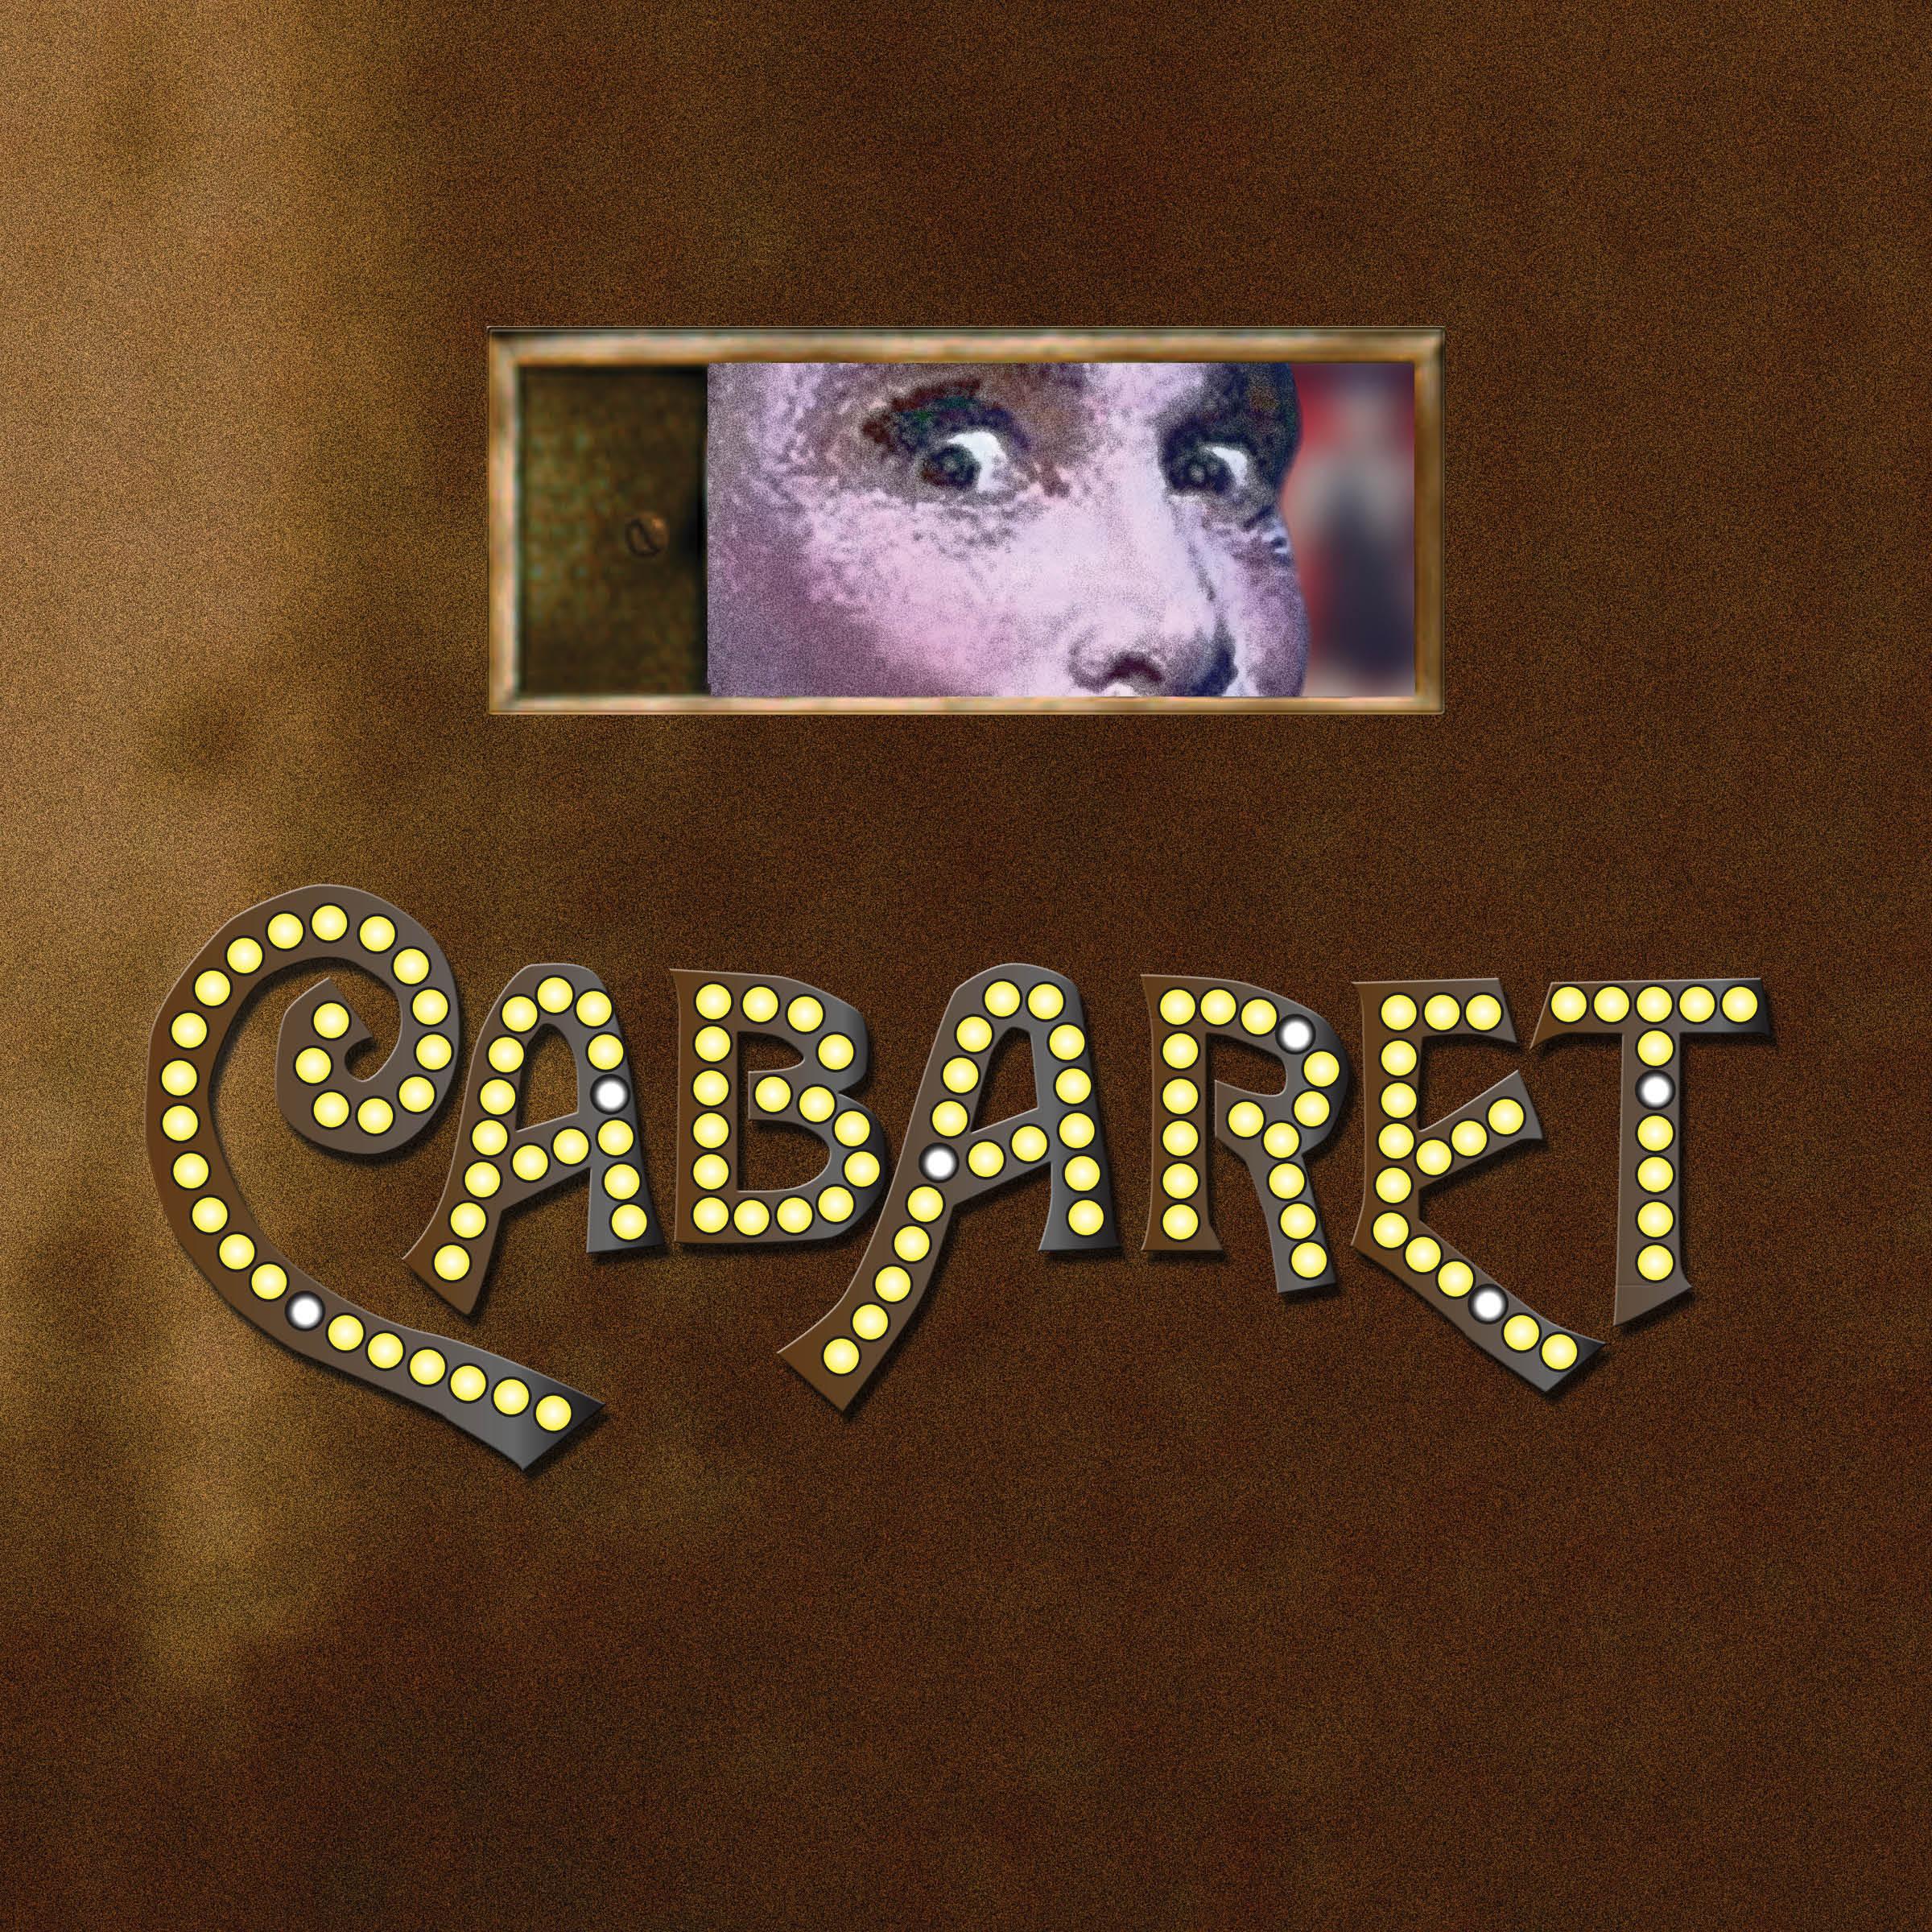 MTC1819_Sq_Logos_Cabaret_A.jpg